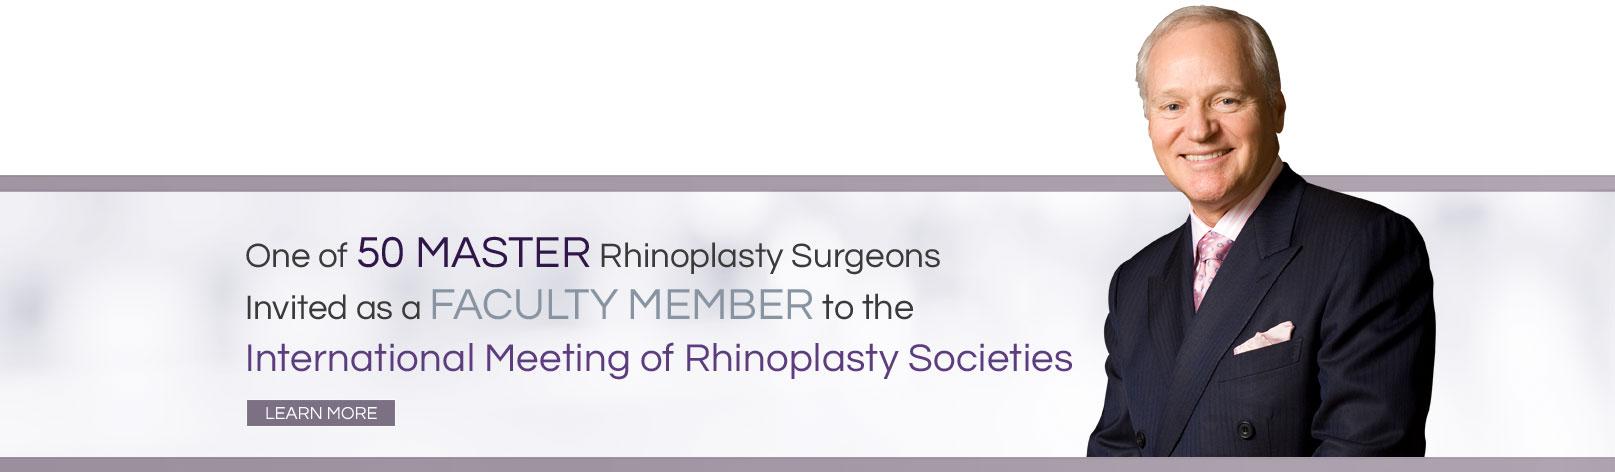 Toronto Master Rhinoplasty Surgeon